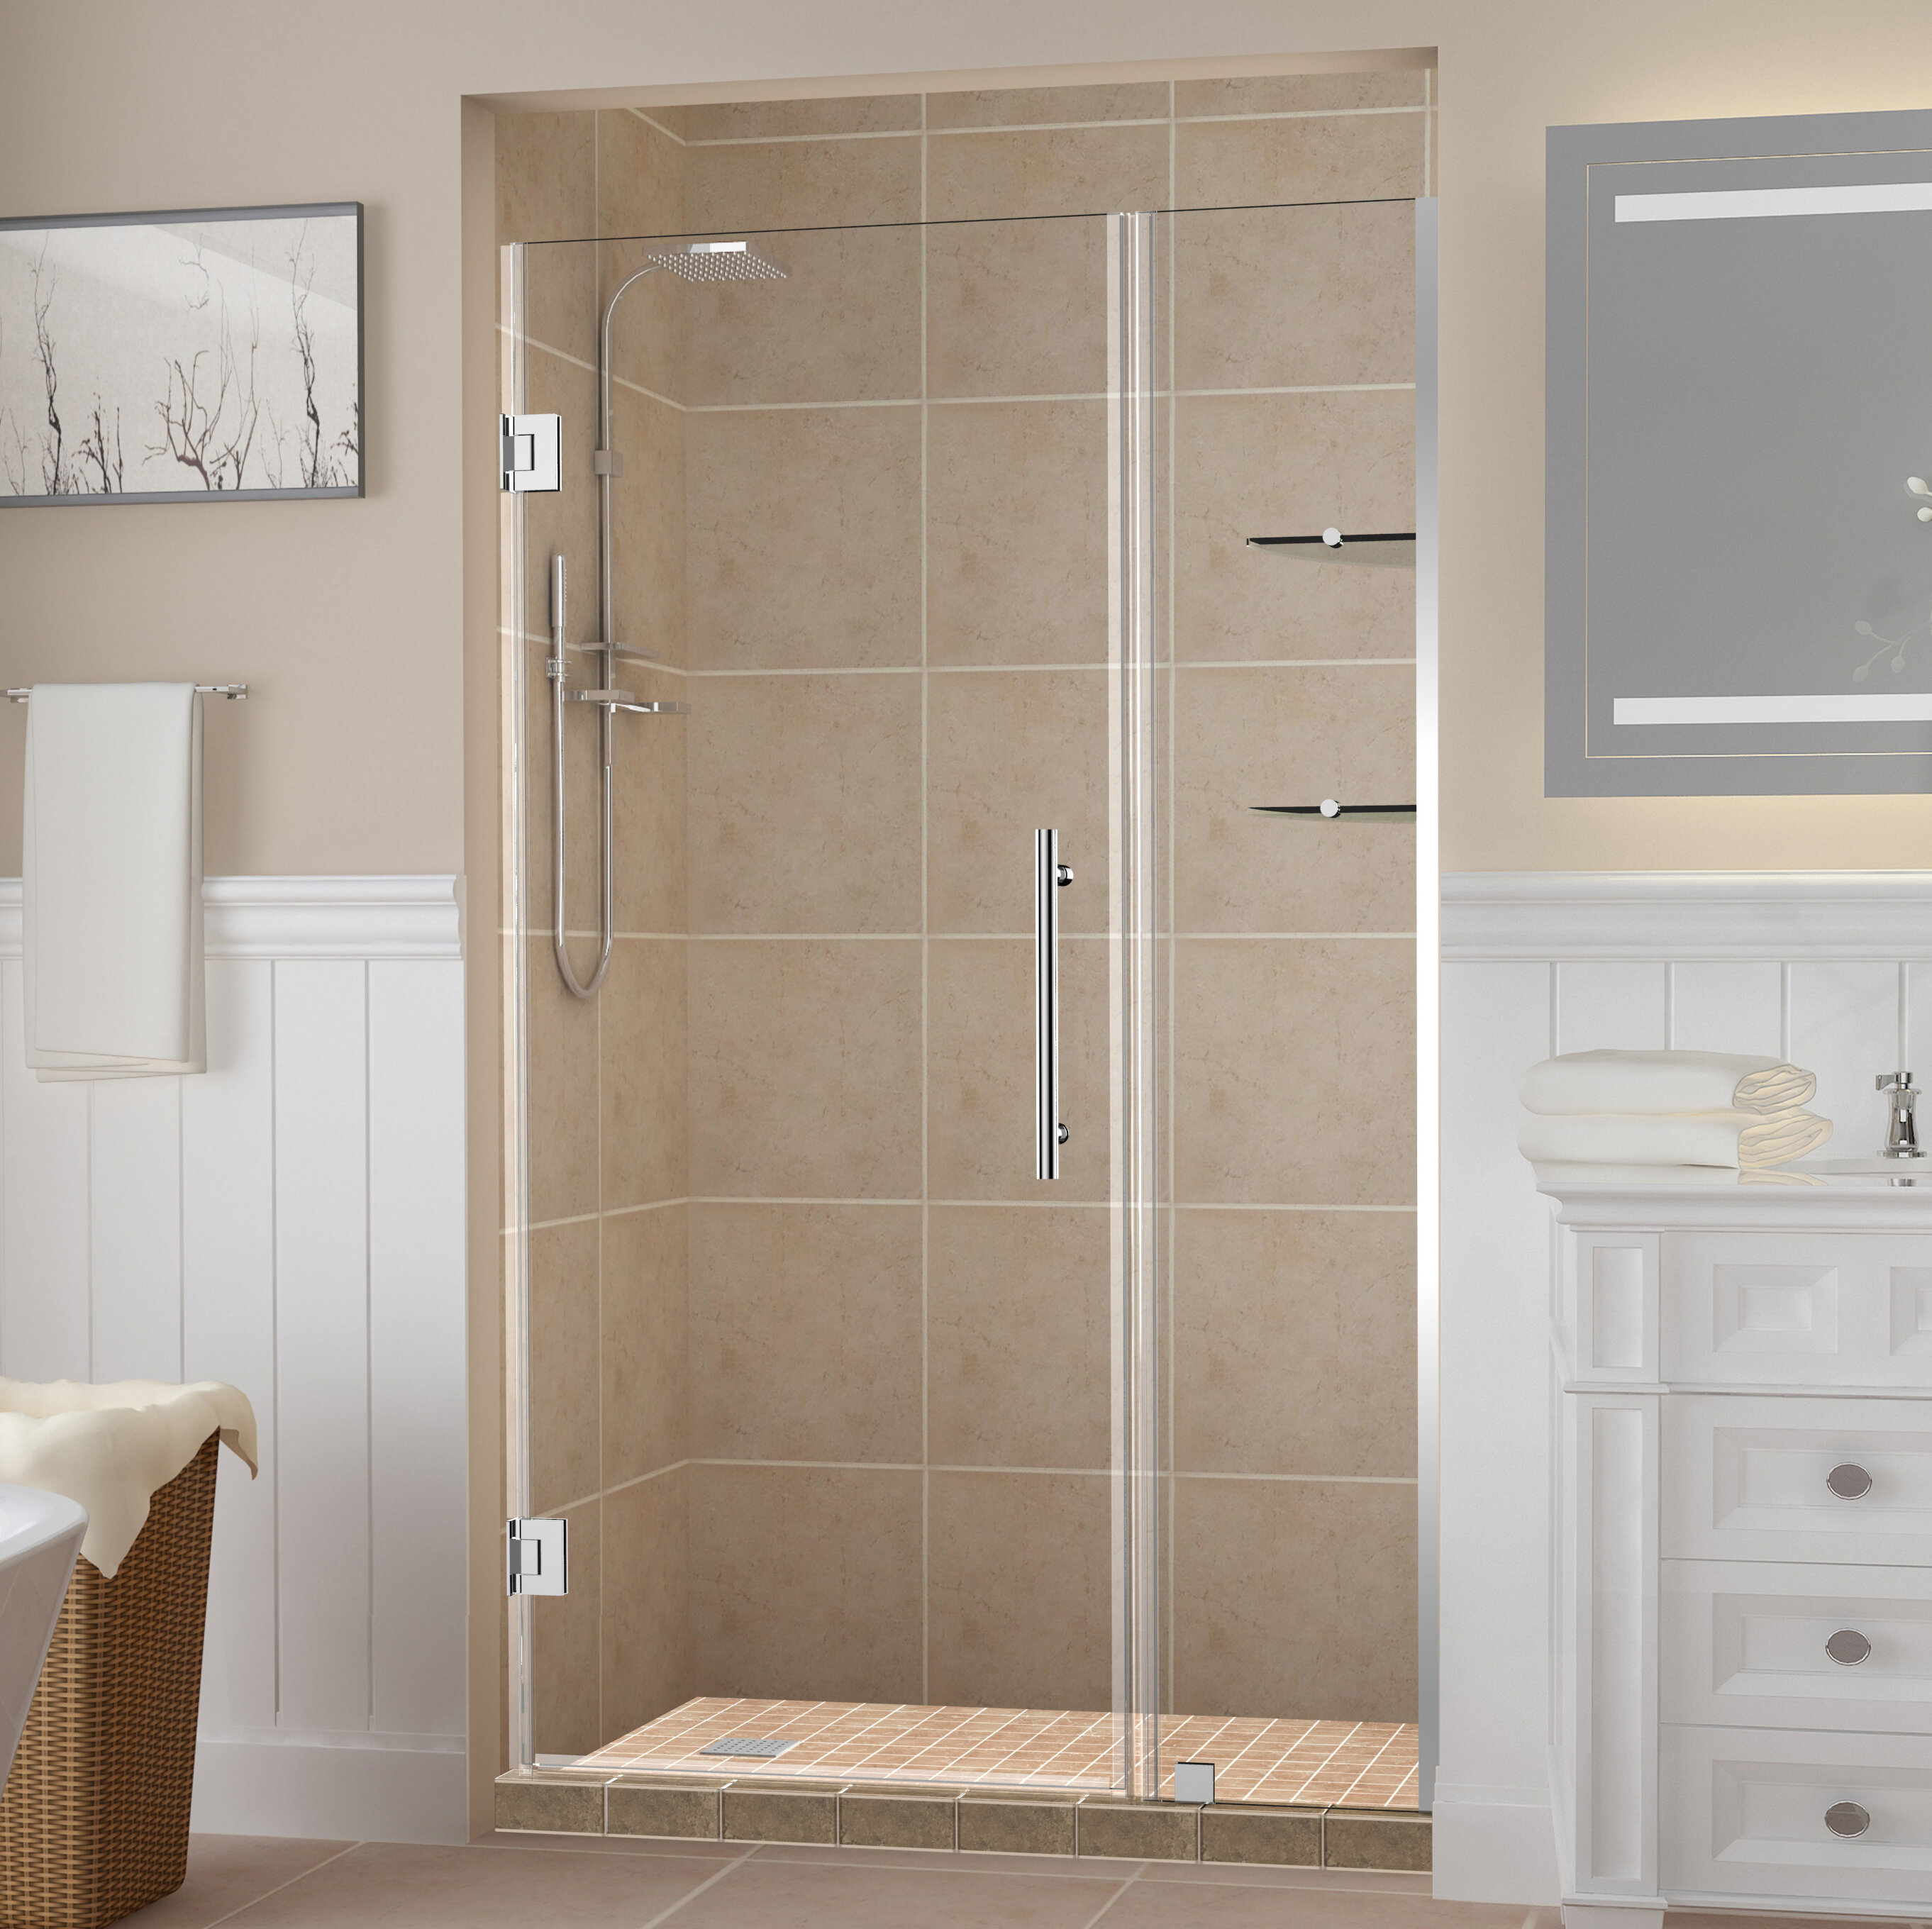 "Belmore GS 10"" x 10"" Hinged Frameless Shower Door"